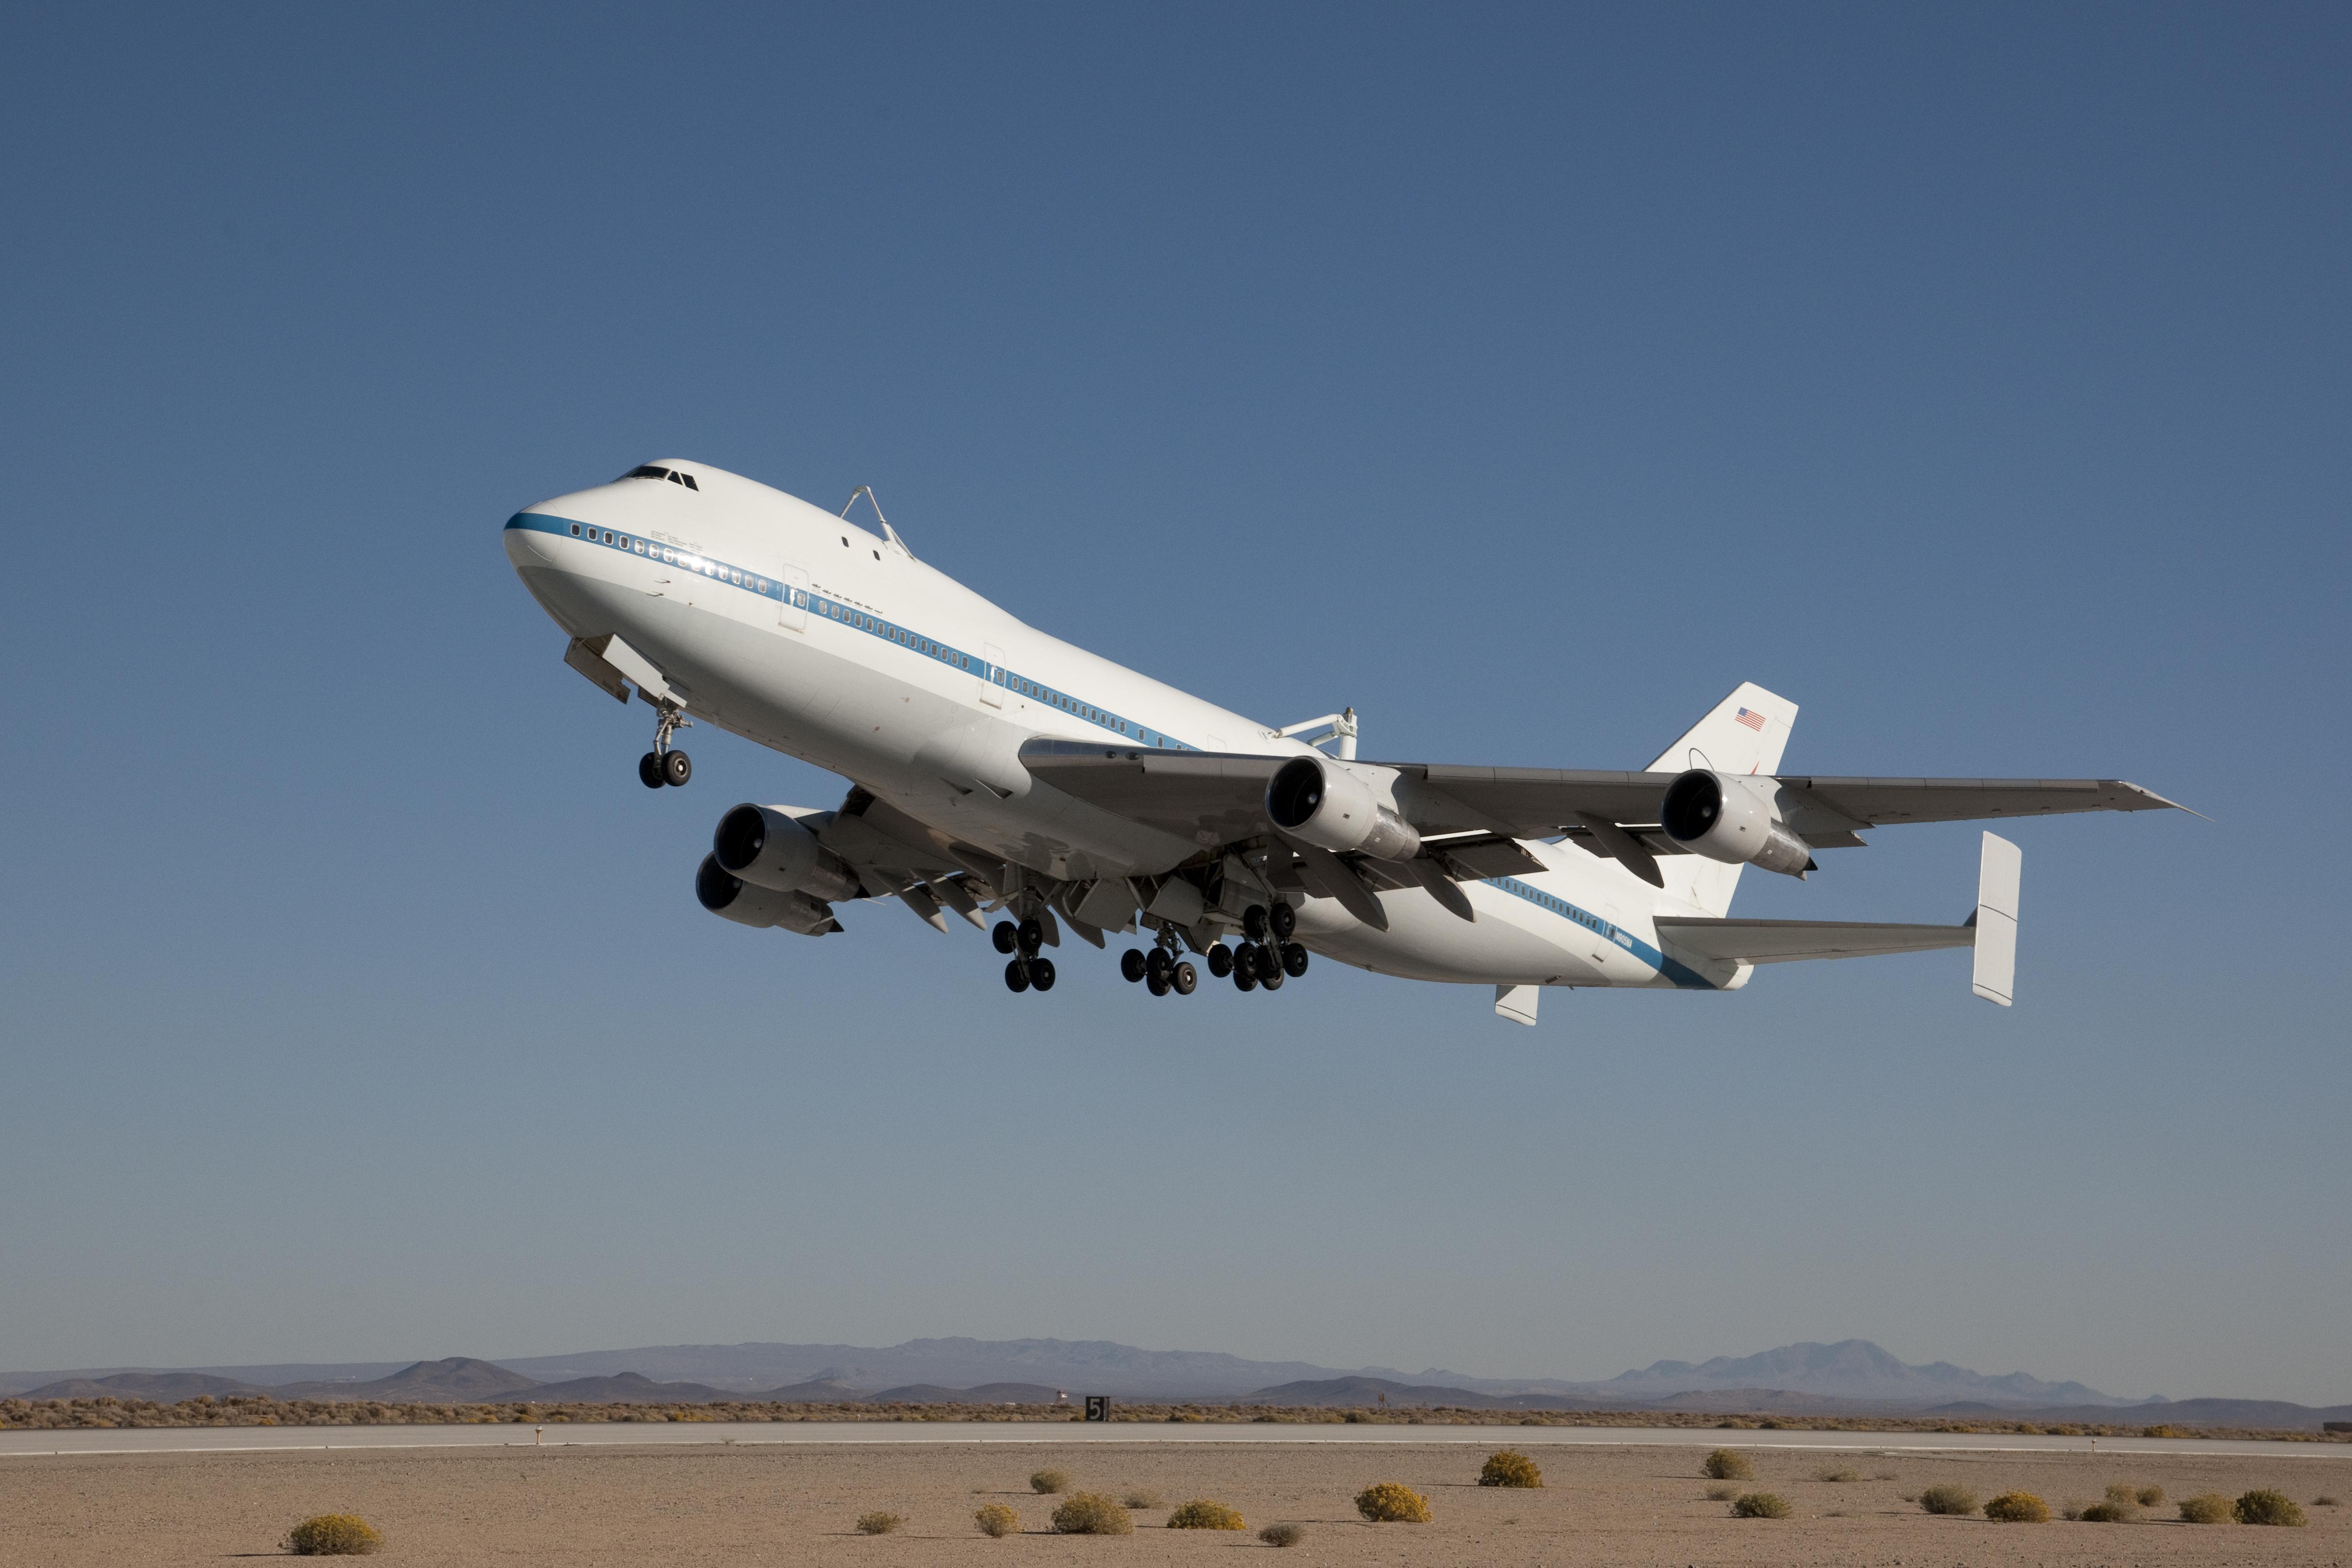 NASA's historic Space ...